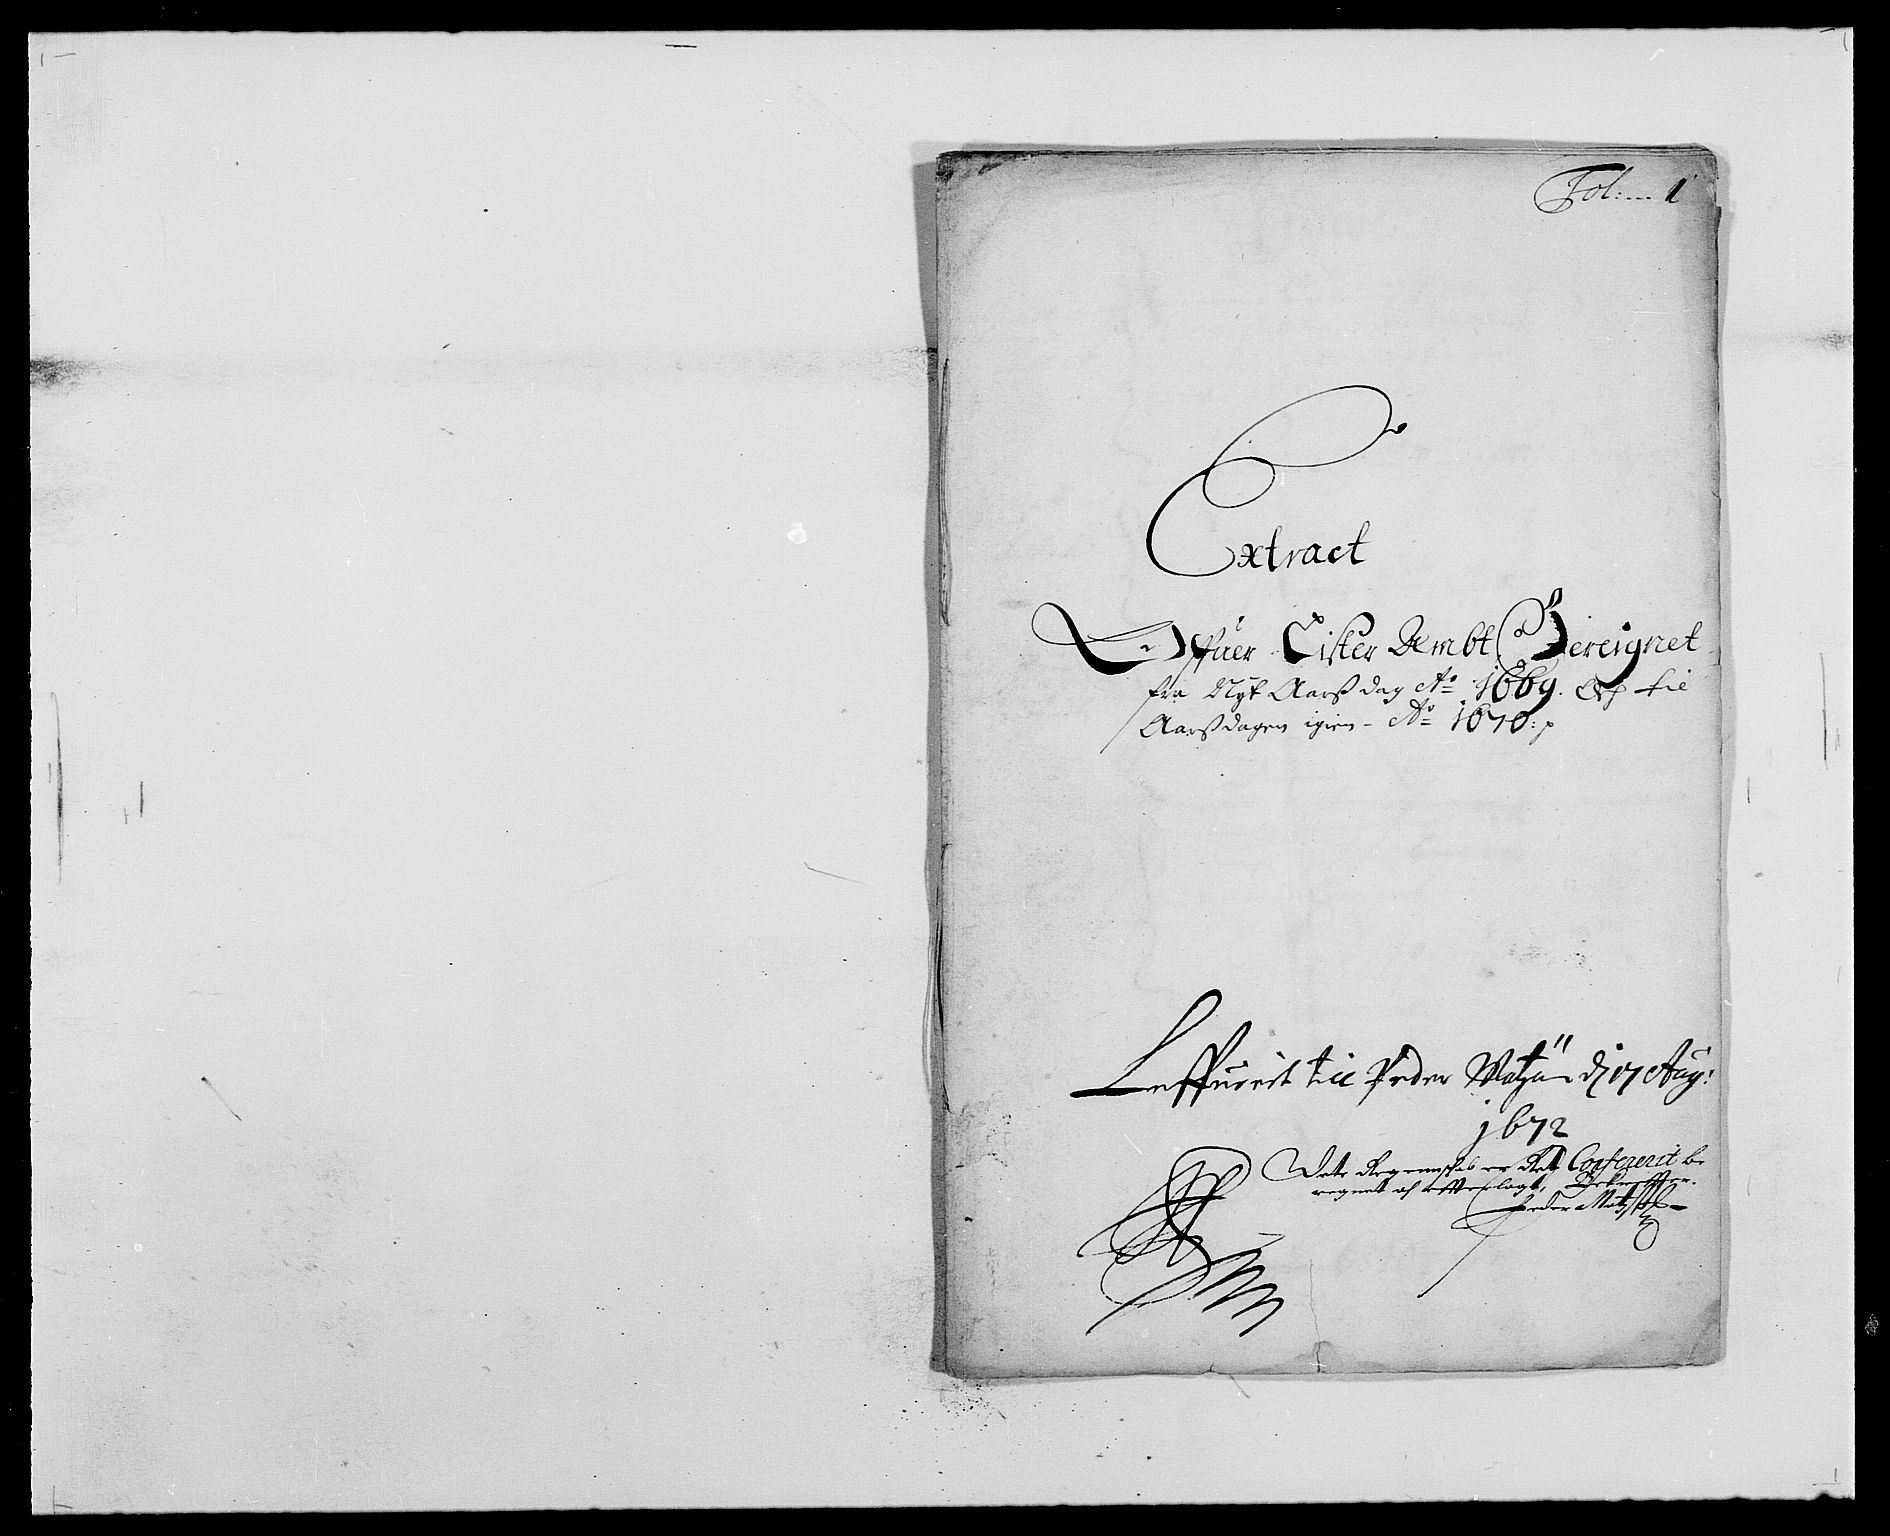 RA, Rentekammeret inntil 1814, Reviderte regnskaper, Fogderegnskap, R41/L2525: Fogderegnskap Lista, 1669-1671, s. 1